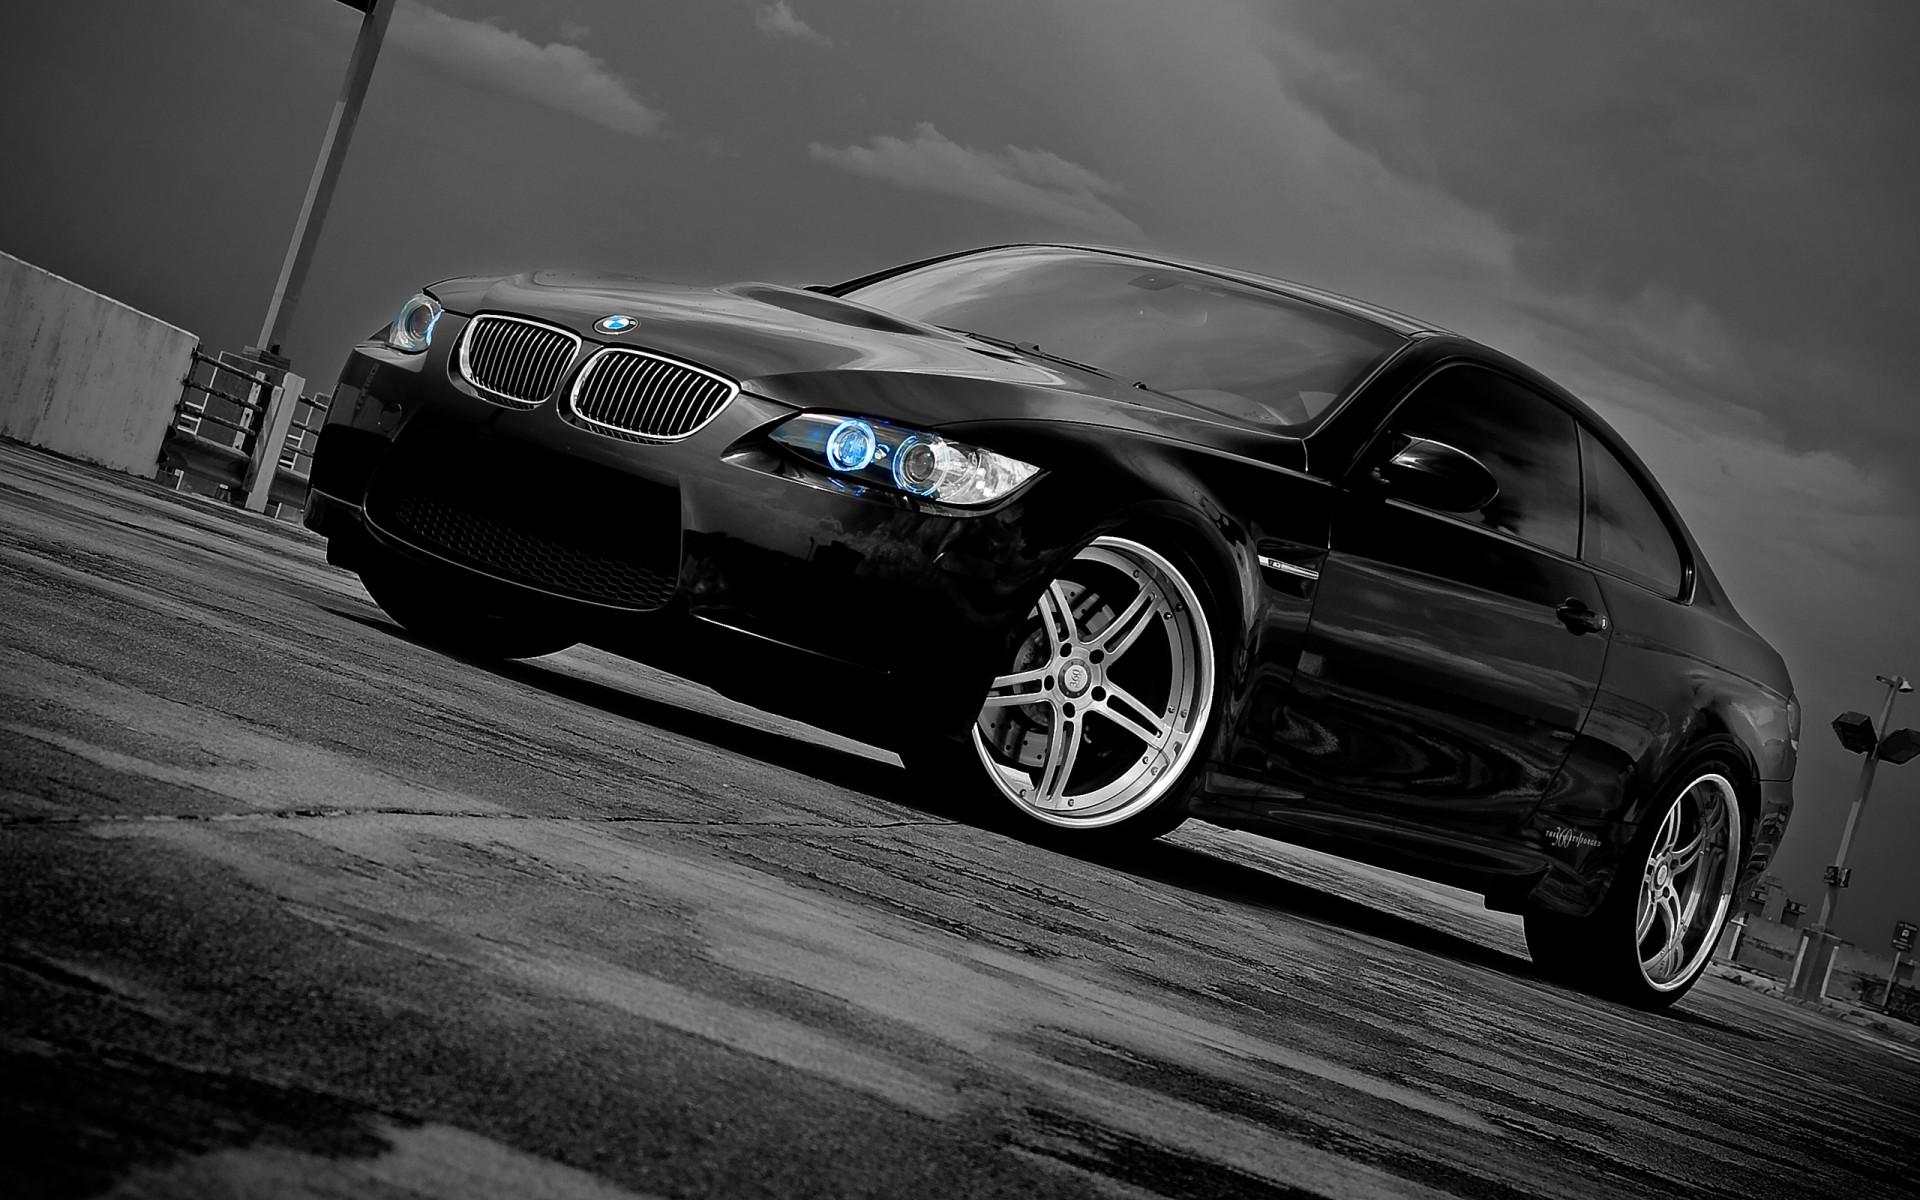 BMW Forged Wheels Wallpaper | HD Car Wallpapers | ID #2696